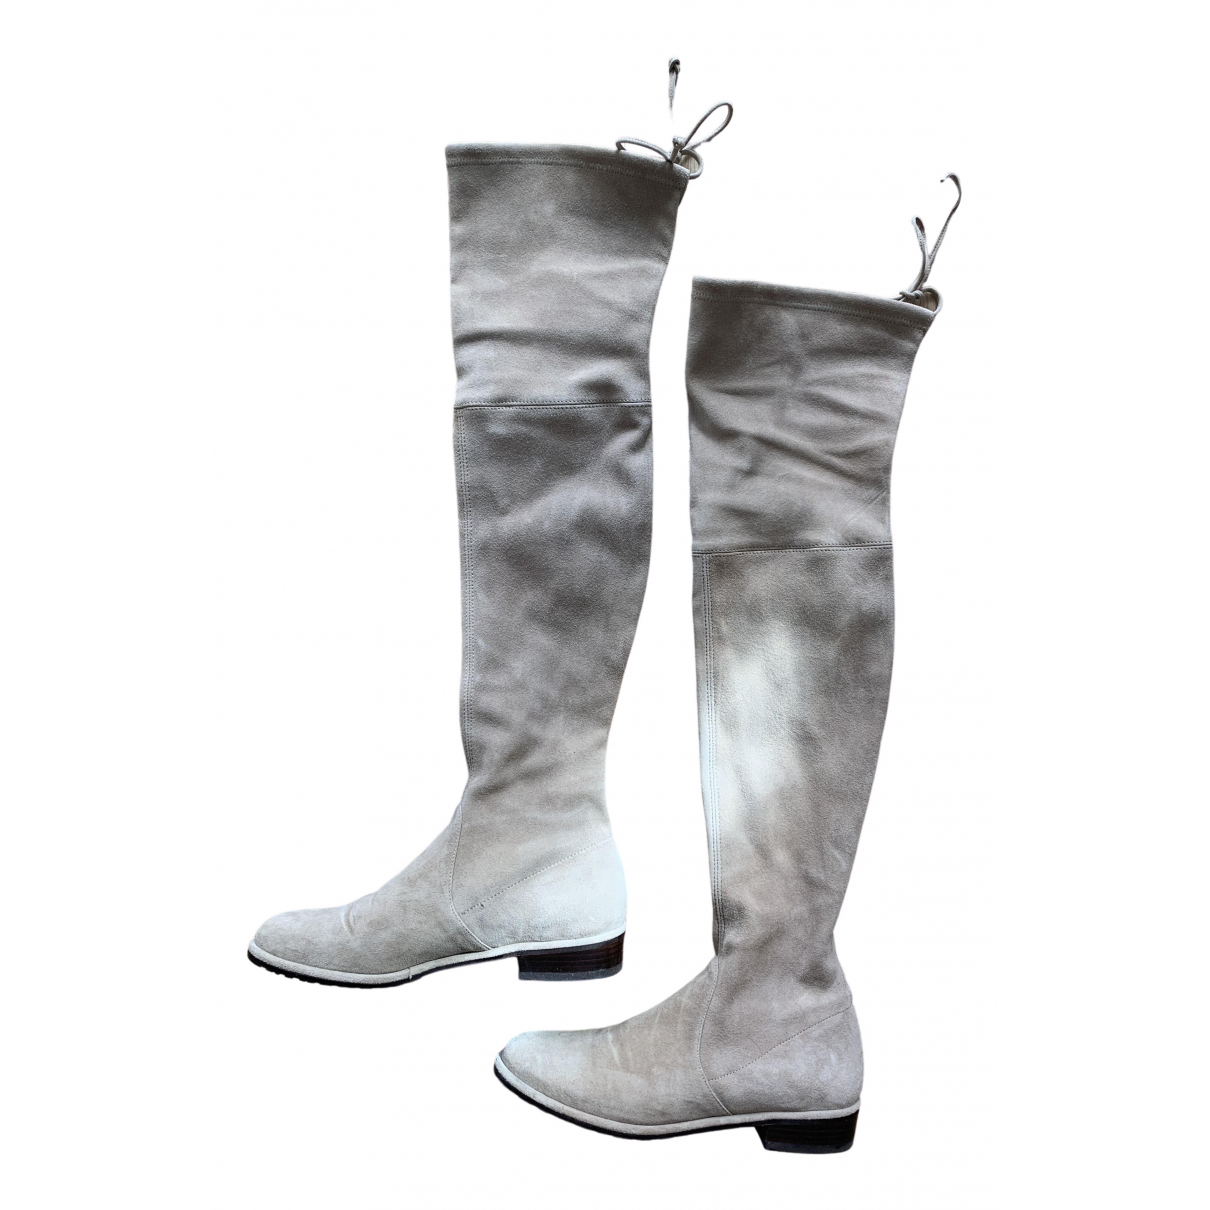 Stuart Weitzman \N Beige Suede Boots for Women 36 IT